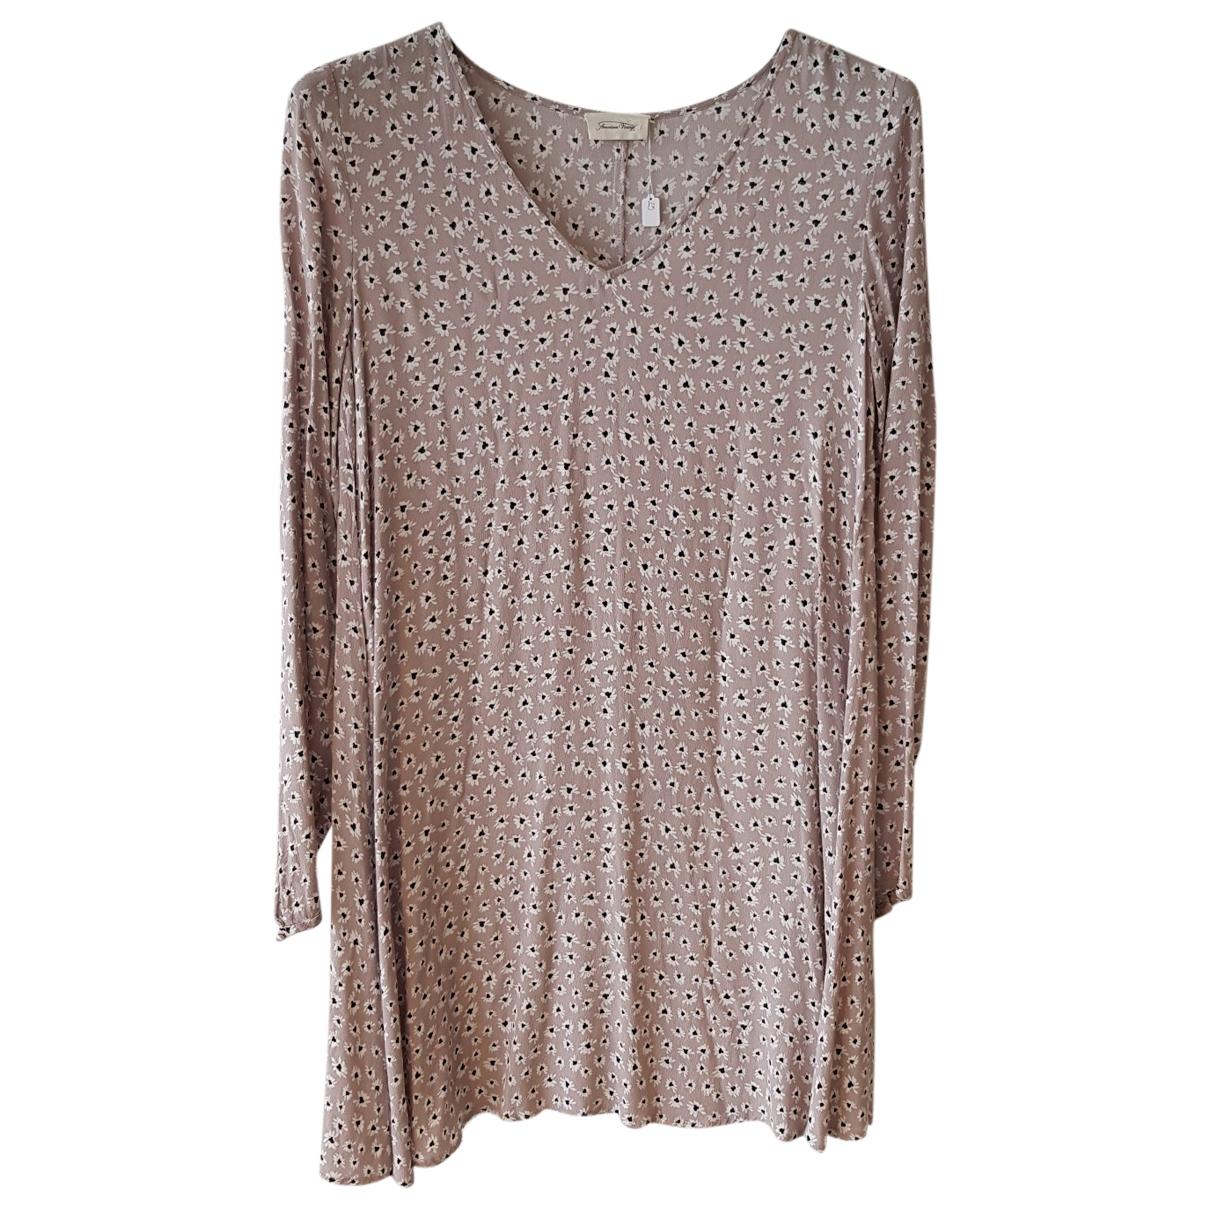 American Vintage \N Pink dress for Women M International